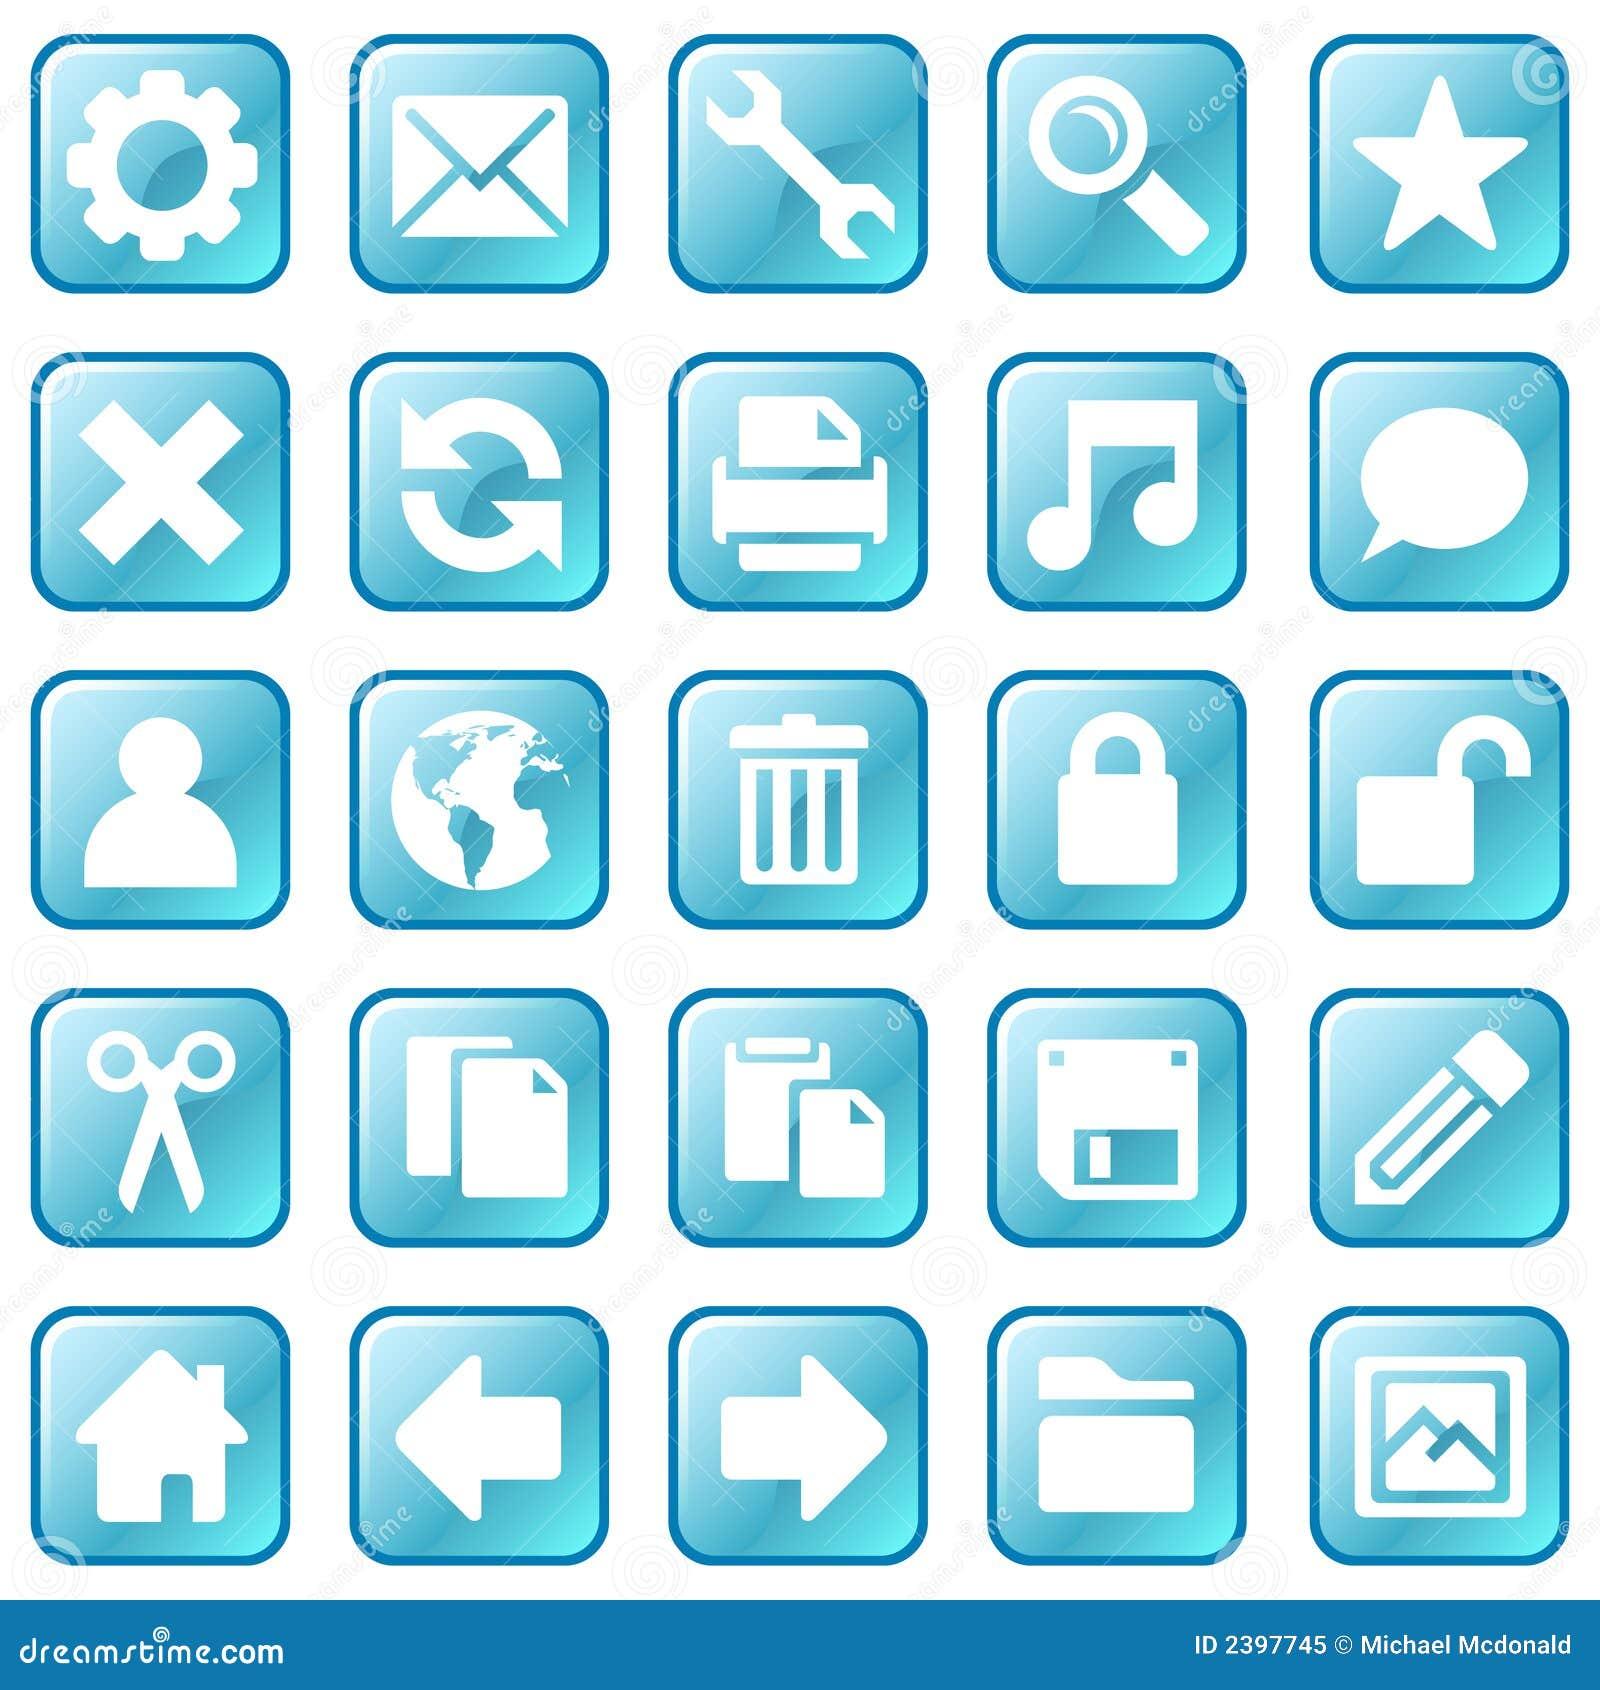 Ice Blue Icons Royalty Free Stock Image